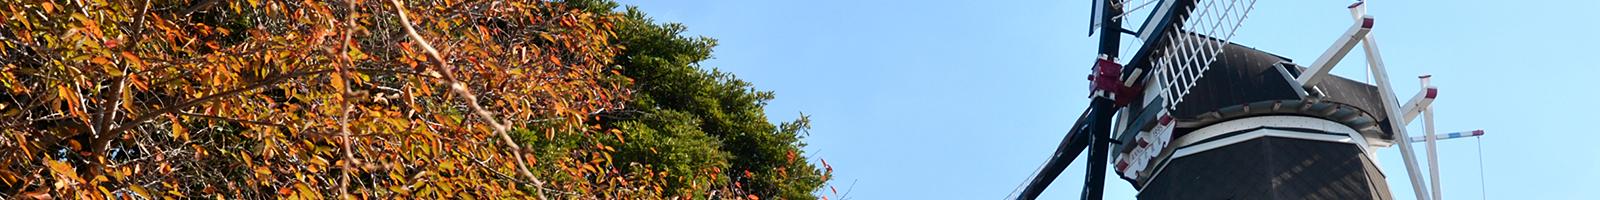 使用店舗一覧(小売) - 新南陽商工会議所ホームページ | 周南市 新南陽地区(山口県) | 経営相談 資金繰り 新規創業 経営革新 検定試験など